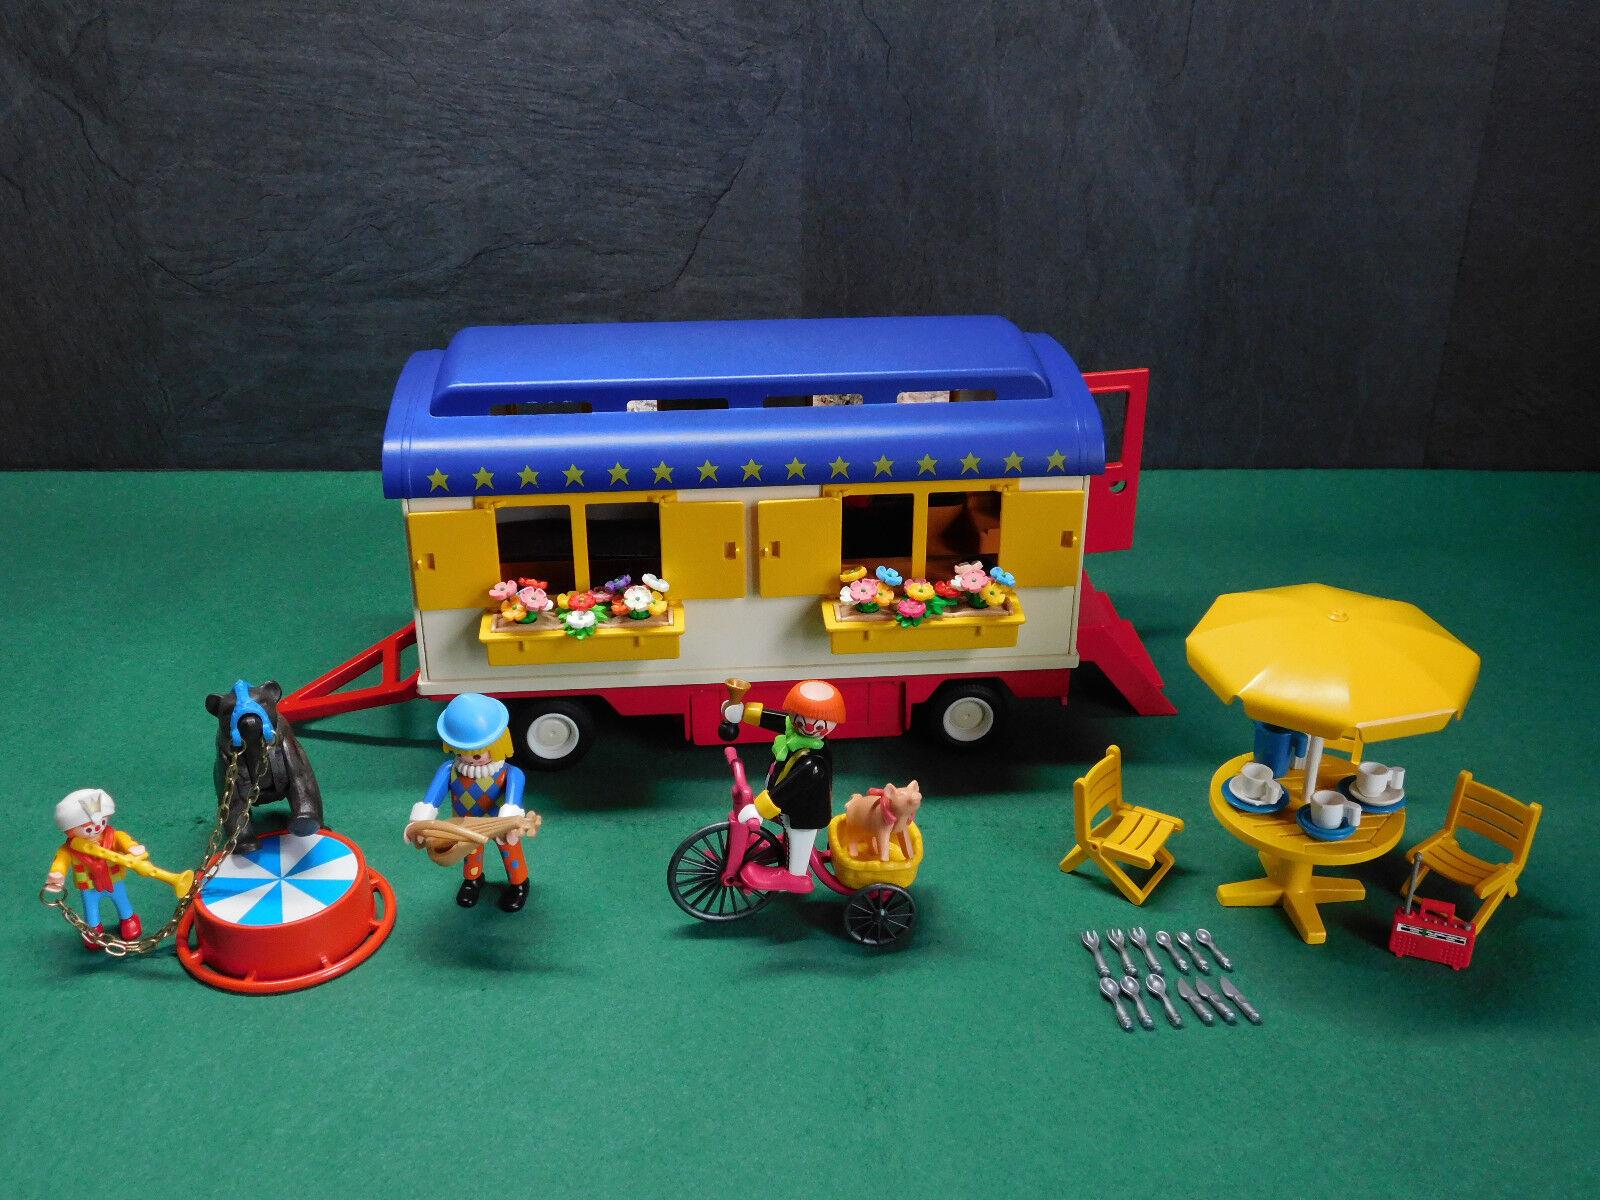 Playmobil Rarität Zirkus-Wohnwagen wie 3728-A 1991 II ohne OVP